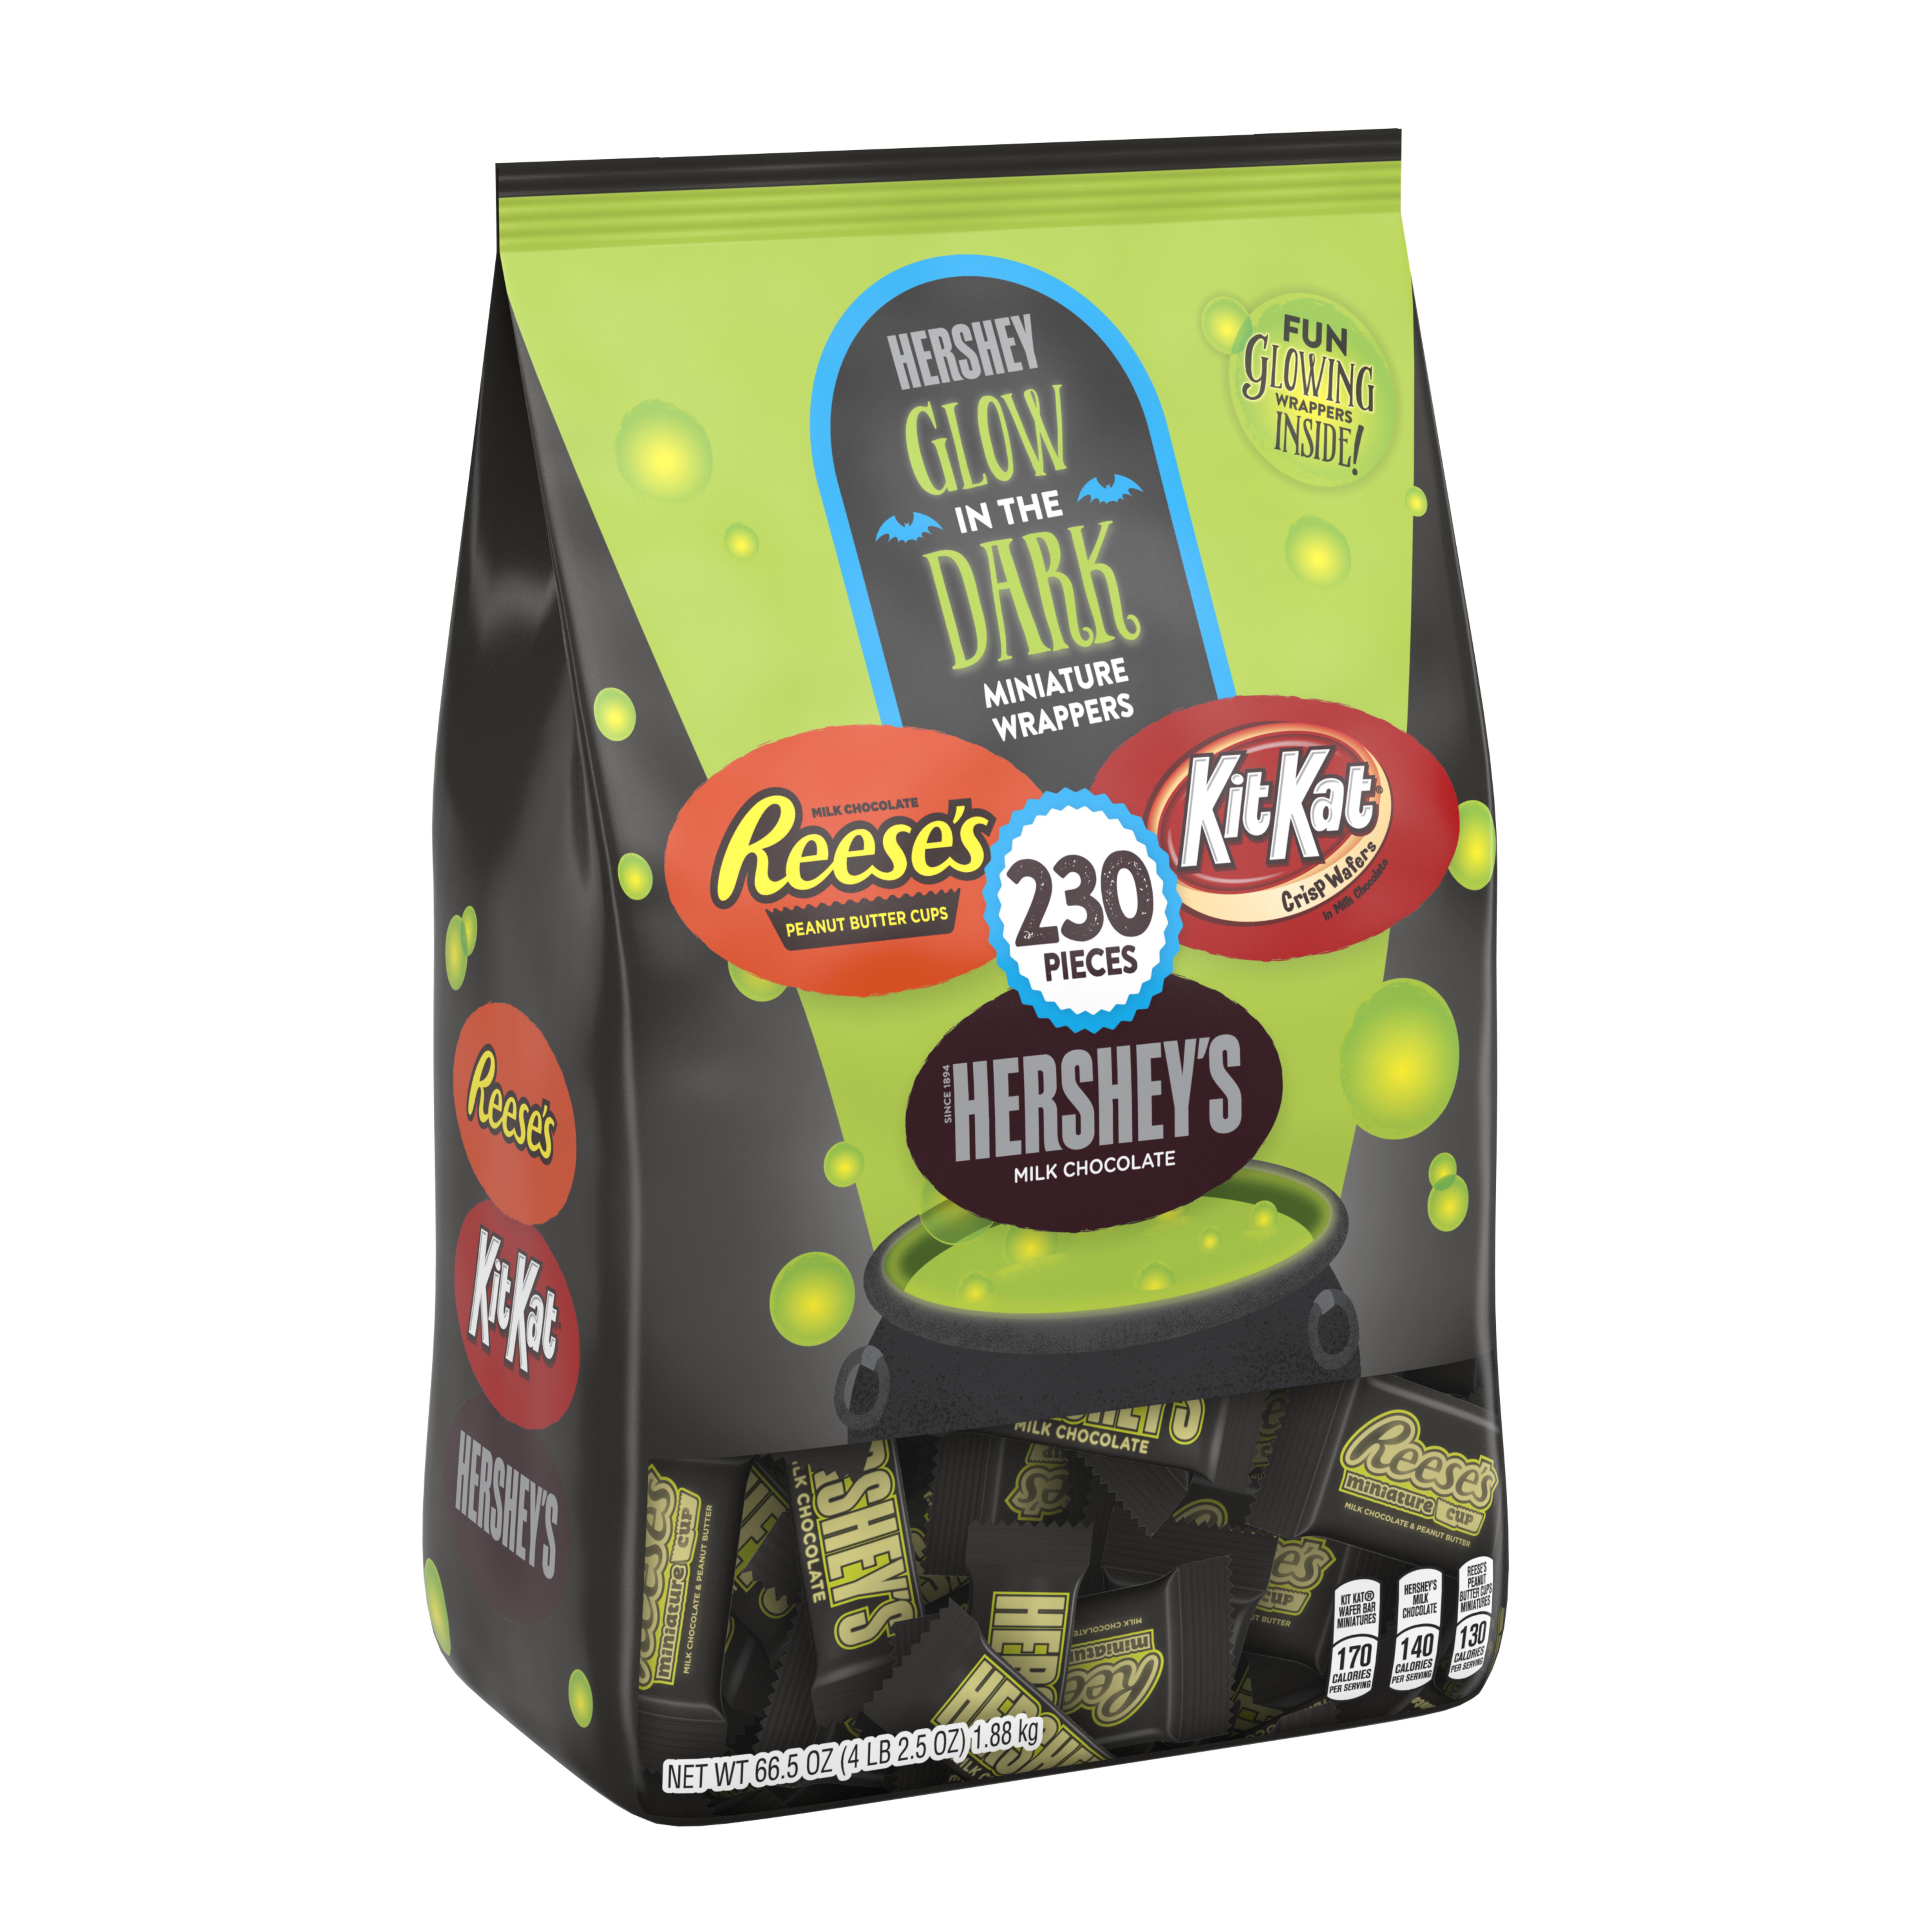 Hershey's, Halloween Chocolate Snack Size Assortment, Glow in the Dark, 230 Ct